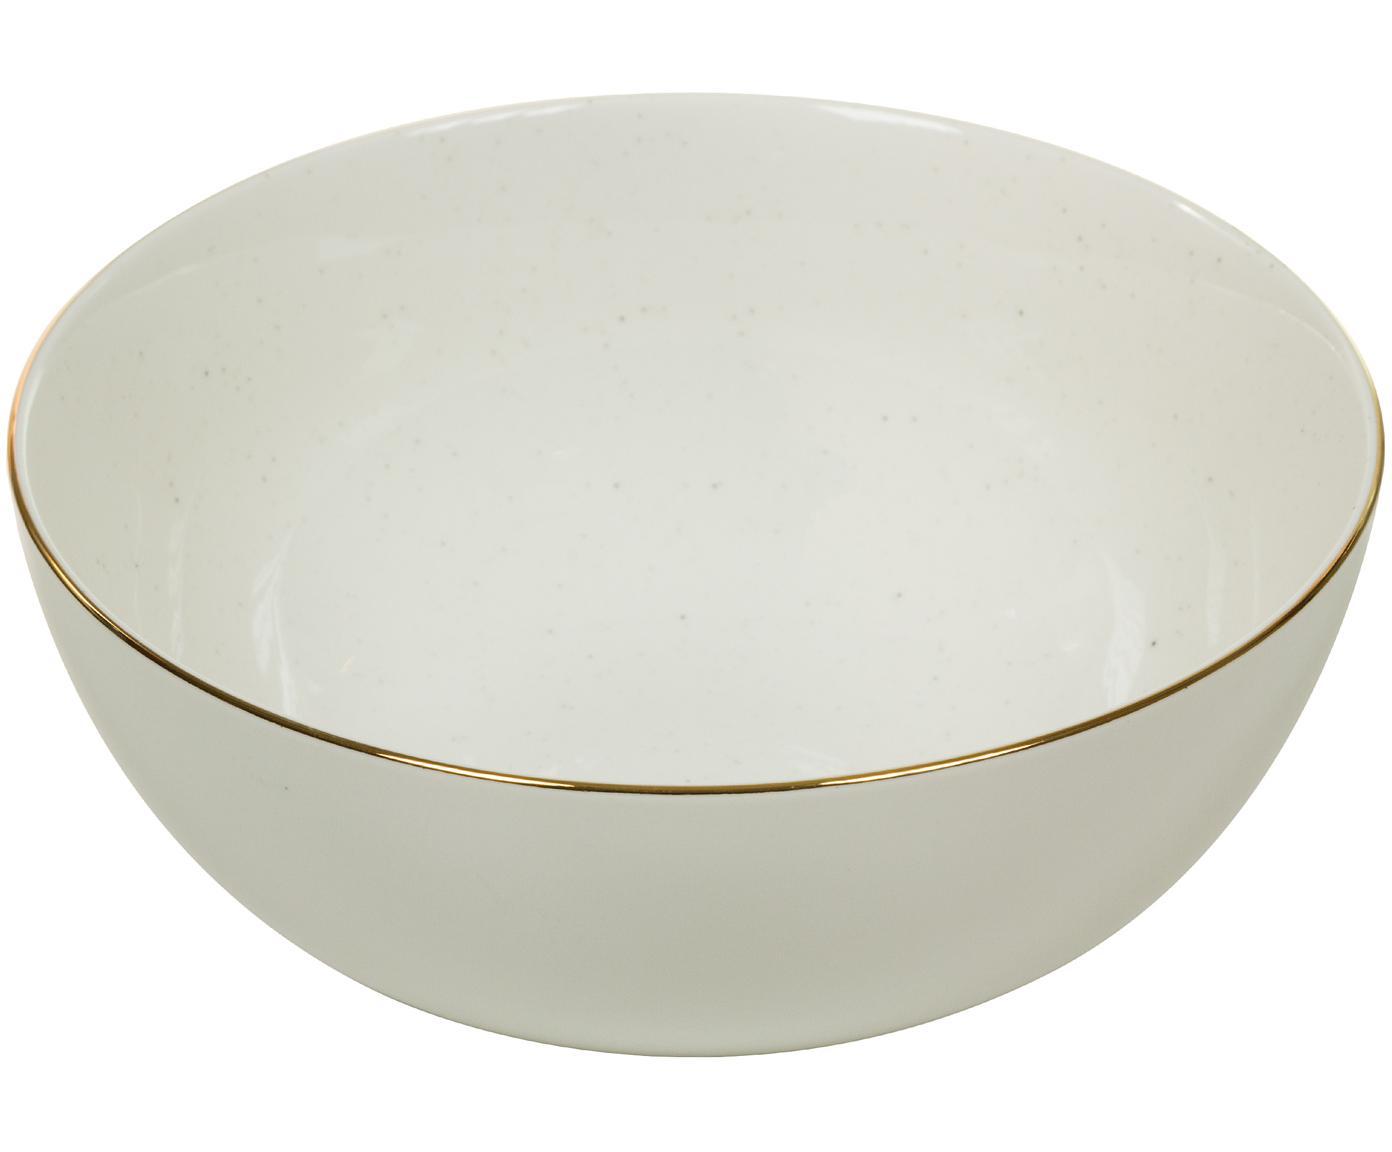 Bol artesanal Bol, Porcelana, Blanco crema, Ø 22 x Al 10 cm